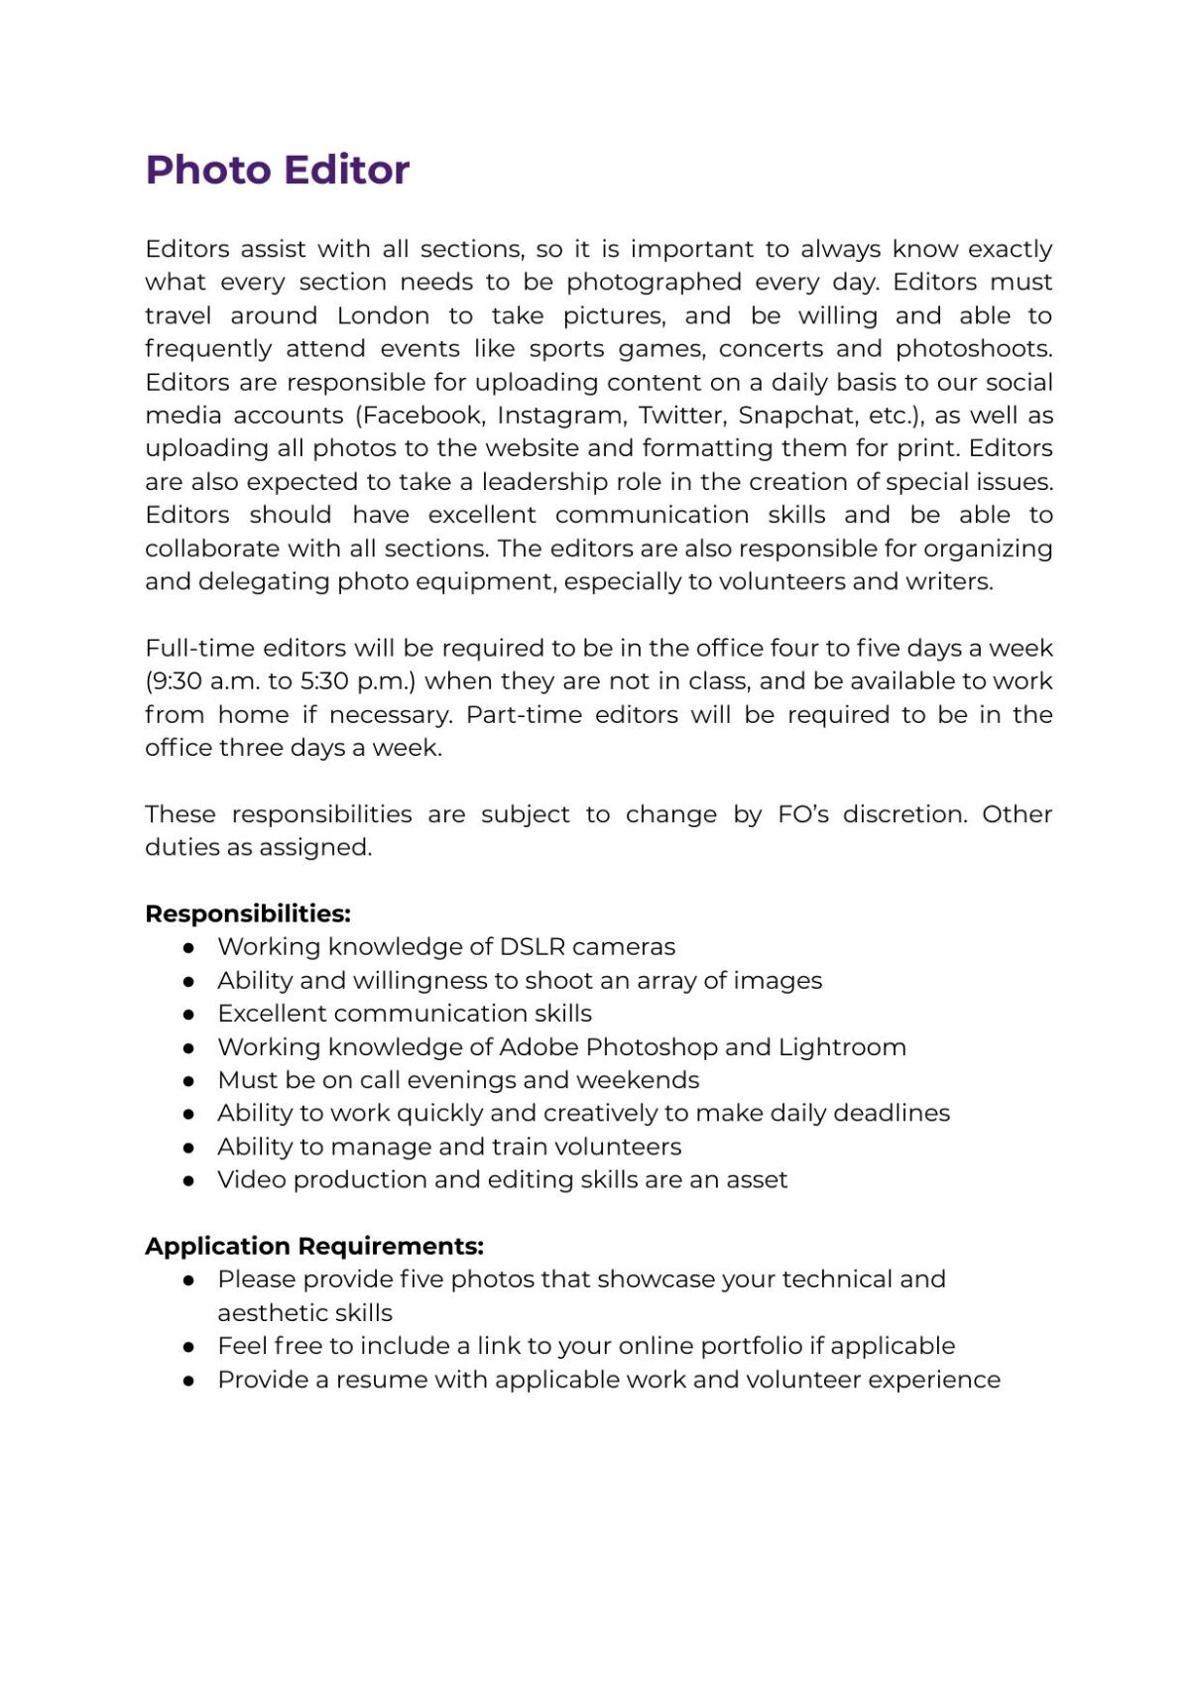 Photo Editor Job Description 2021